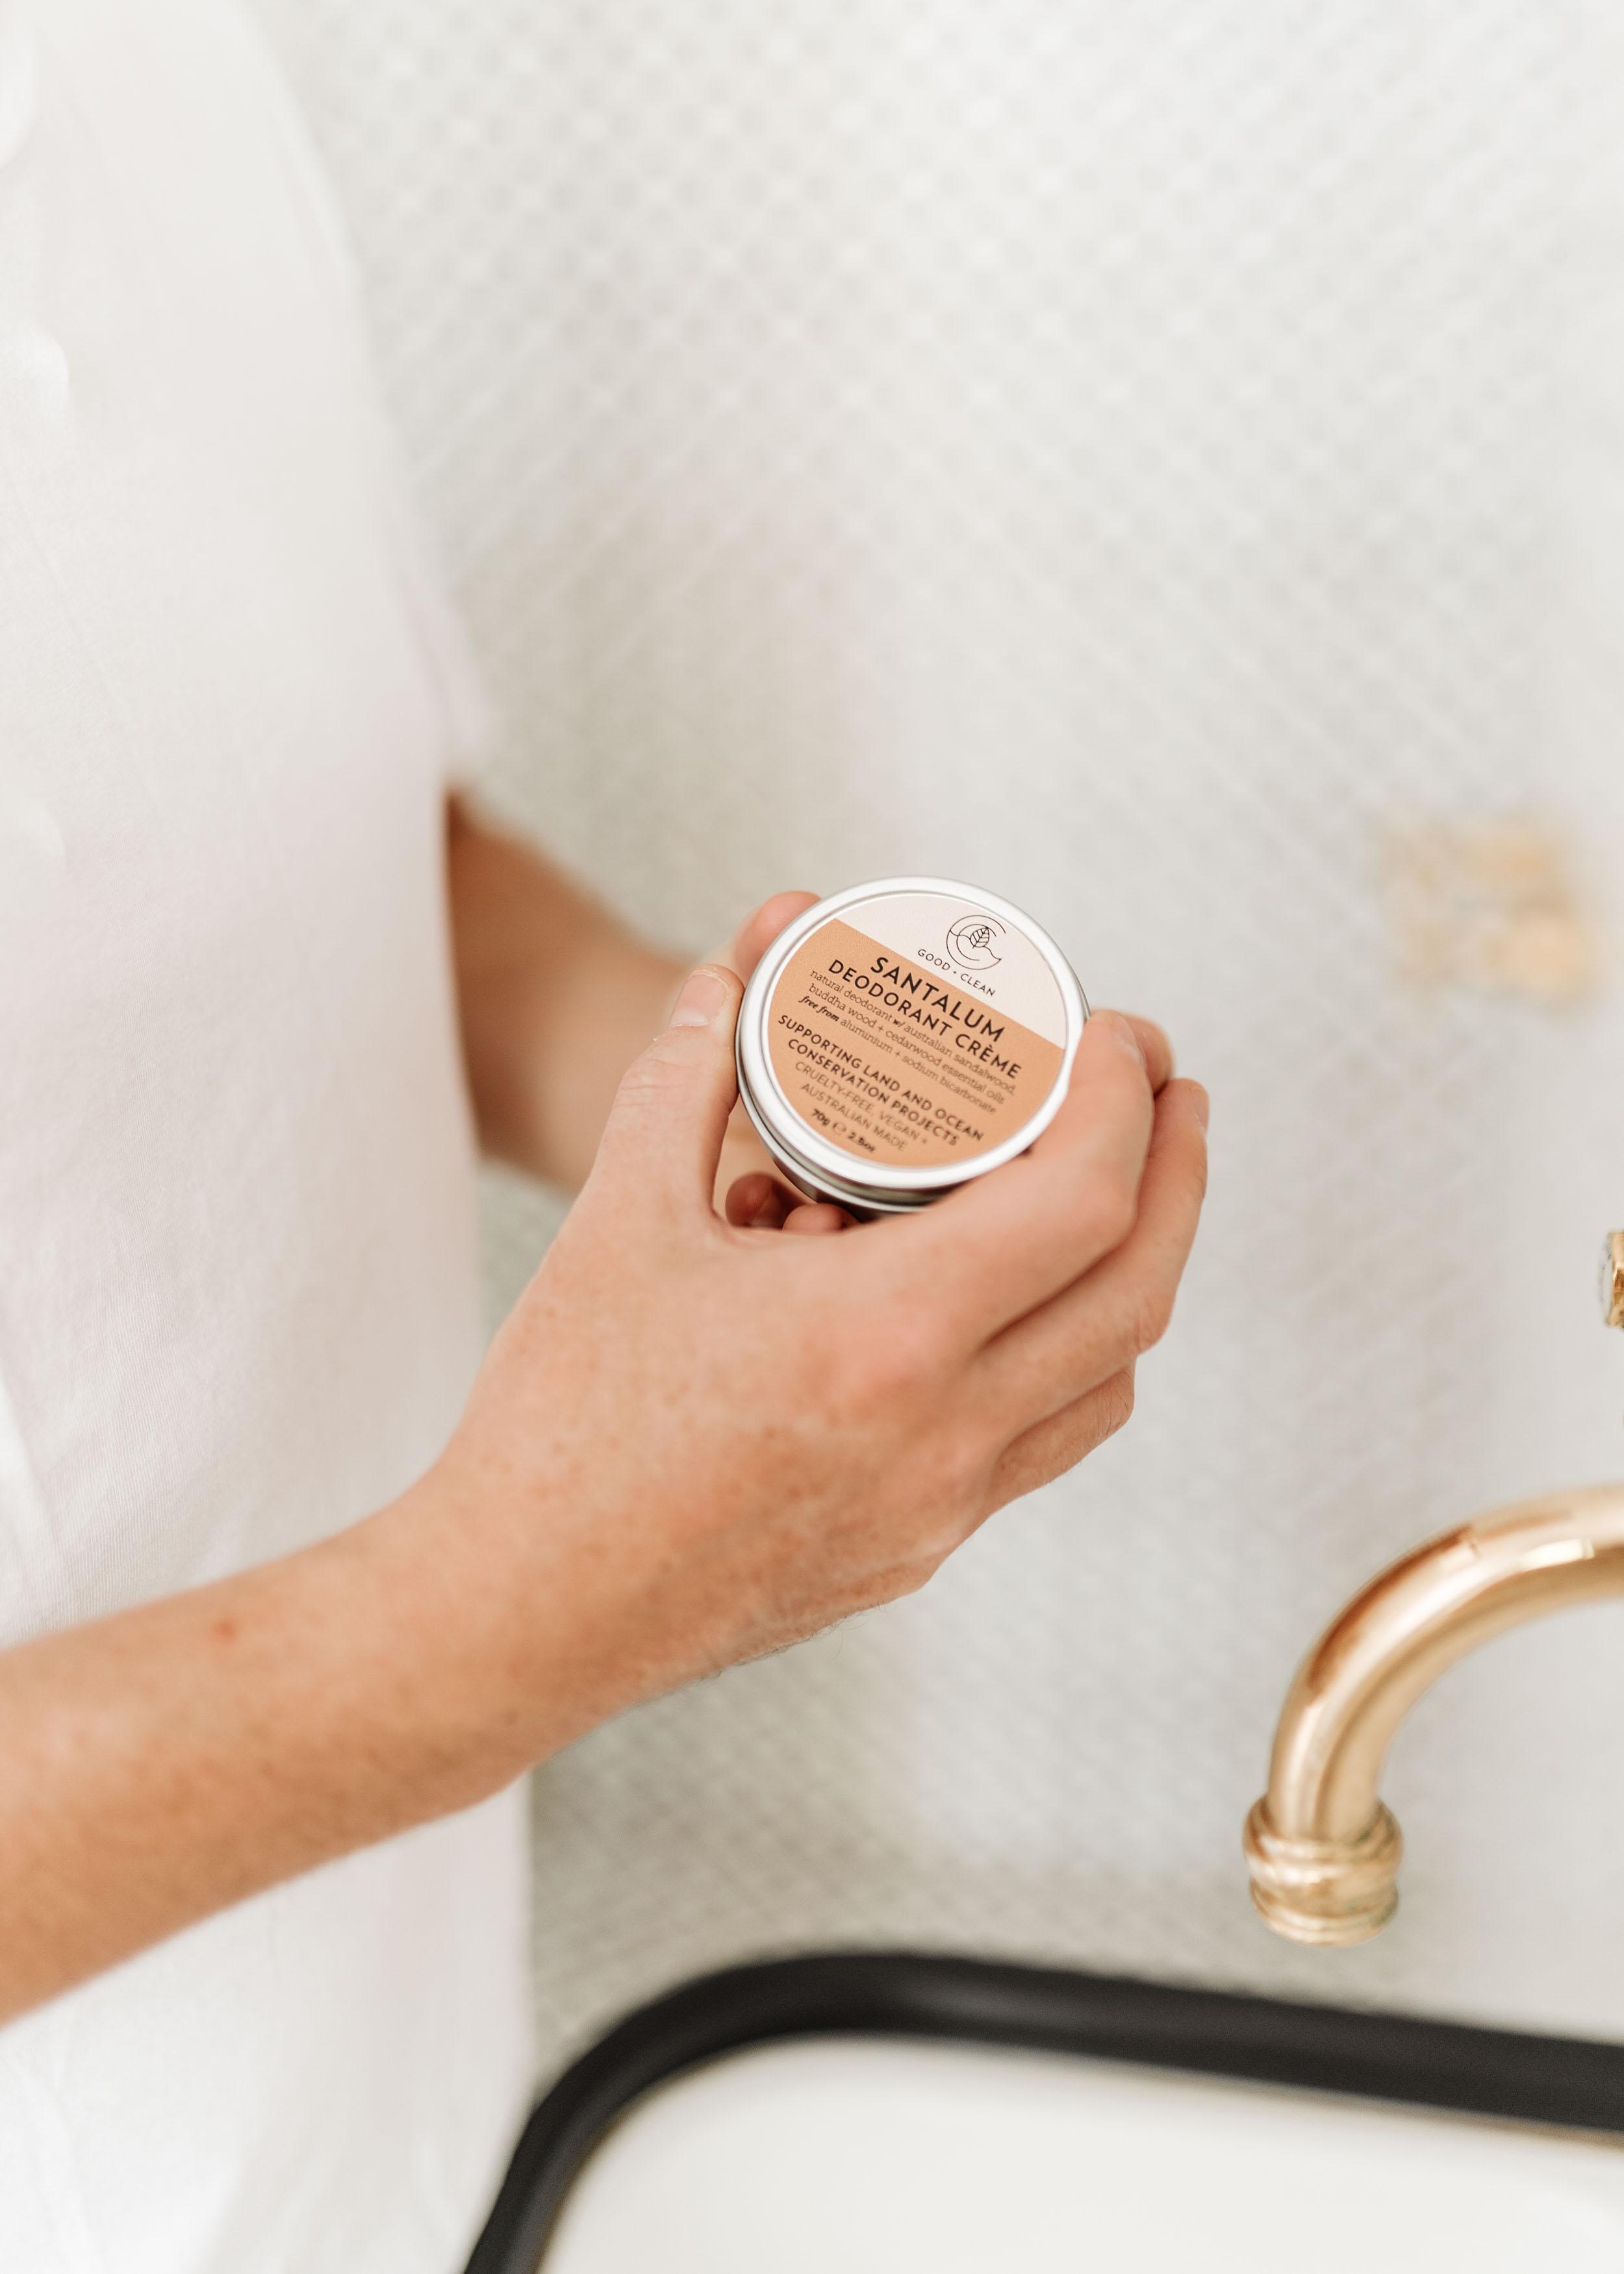 keira-mason-good-and-clean-grounds-of-cabarita-deodorant.jpg